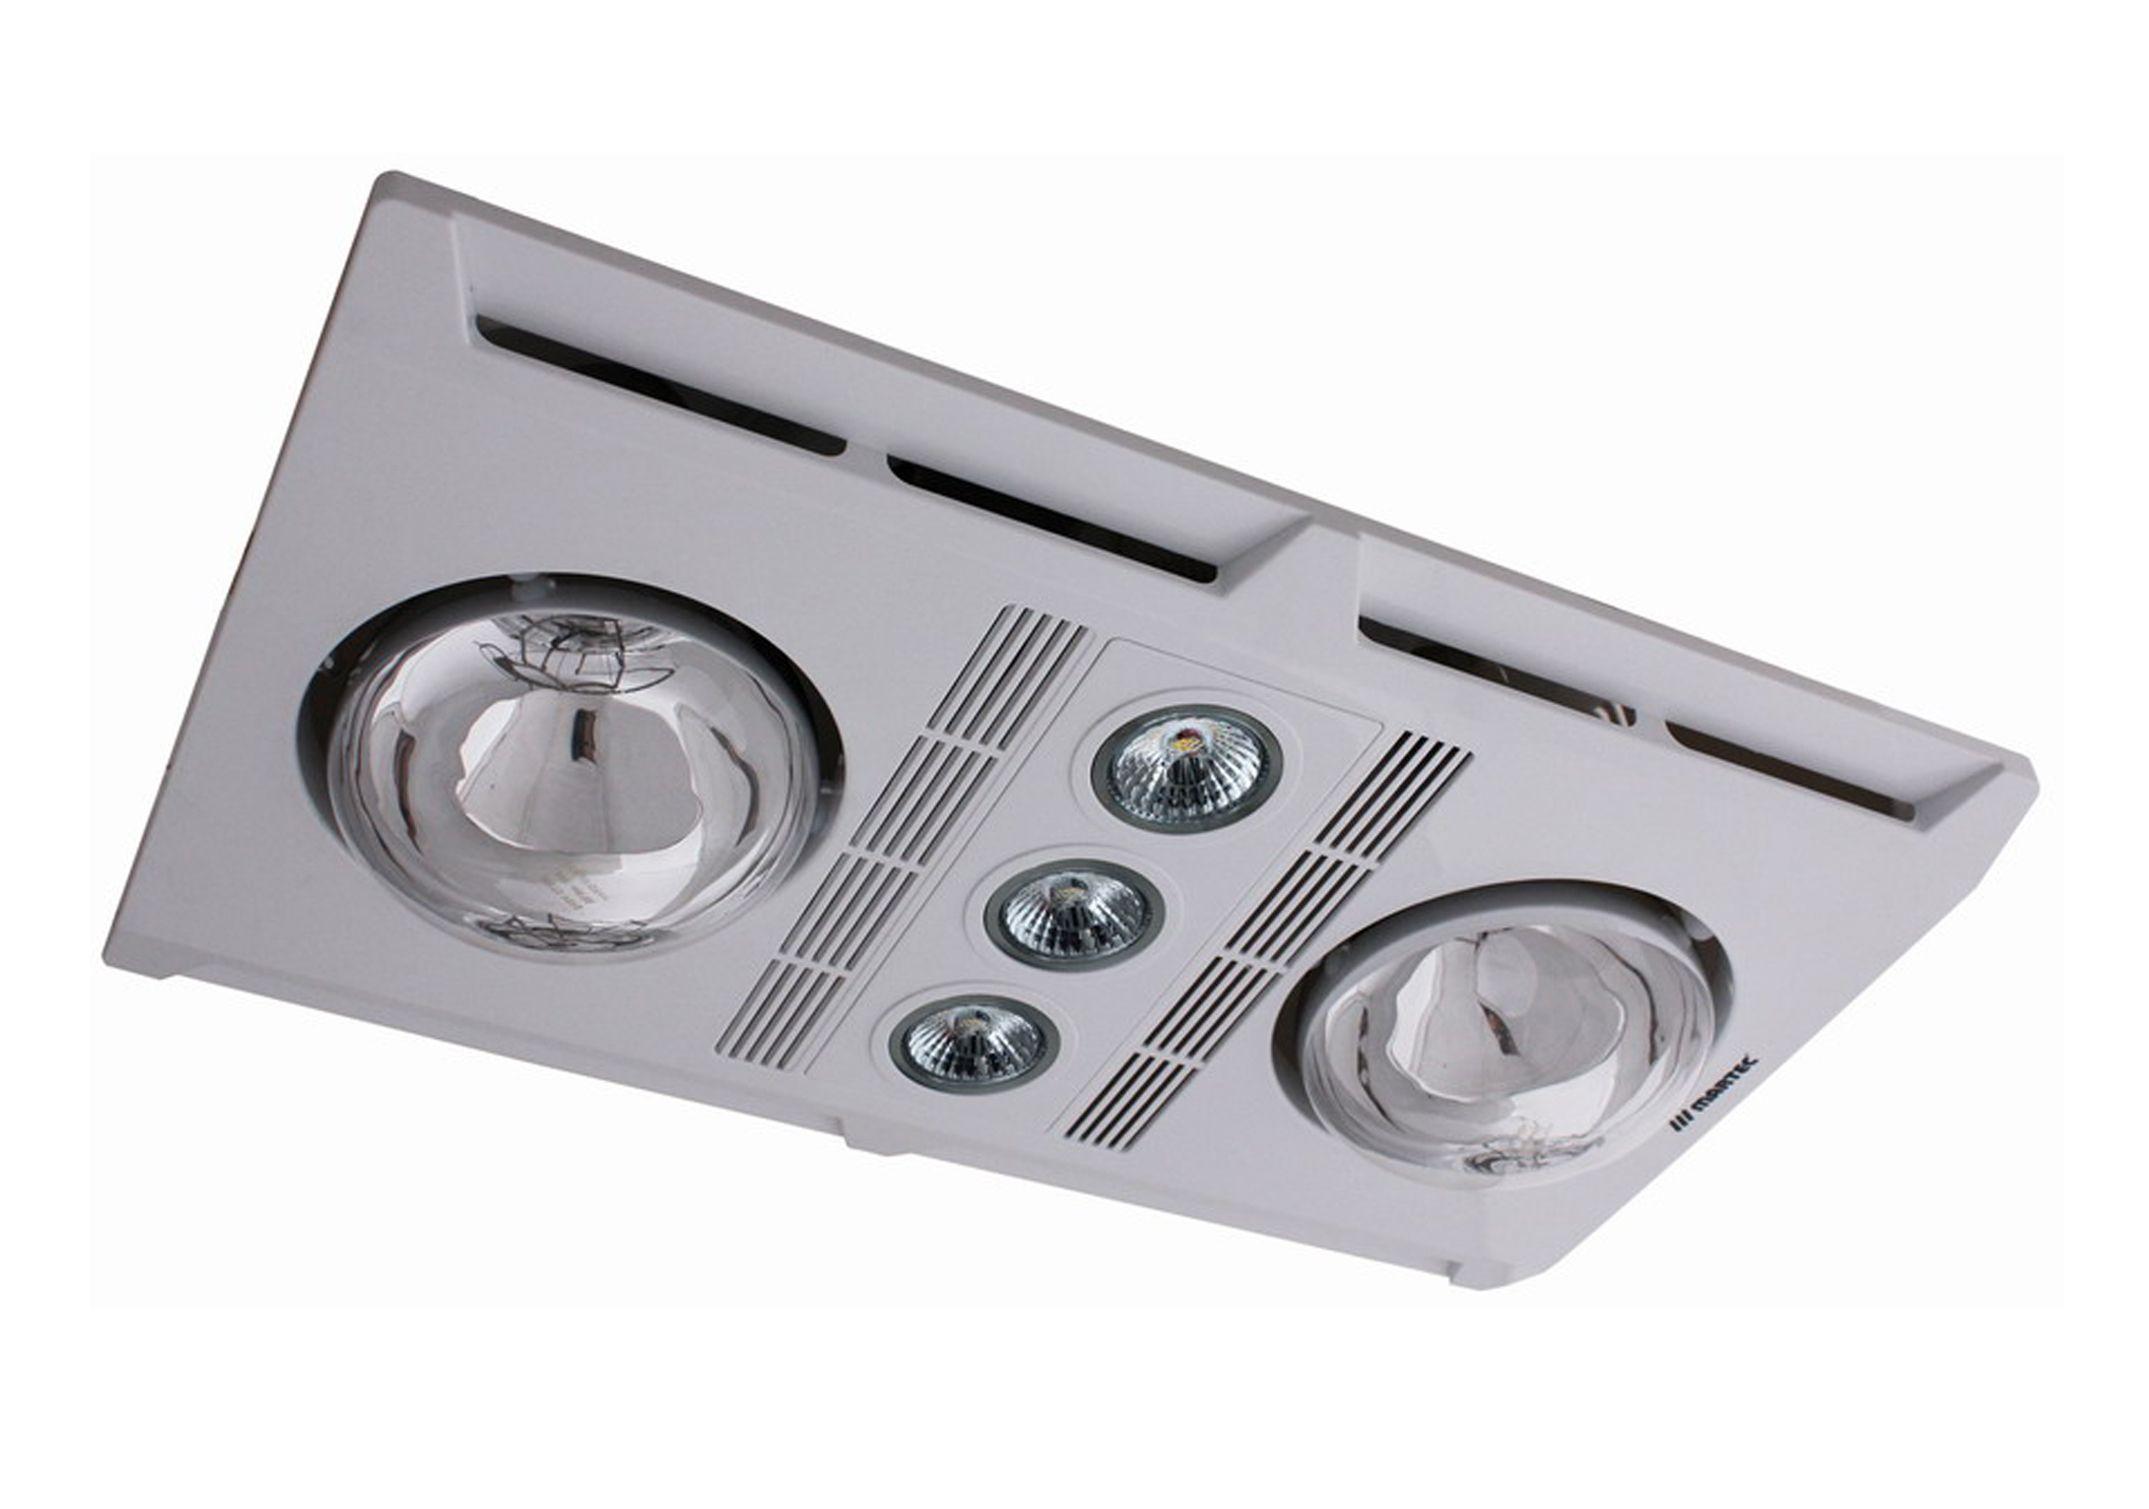 Pin By Martec Australia On Home Decor Bathroom Heater Bathroom Exhaust Fan Exhaust Fan